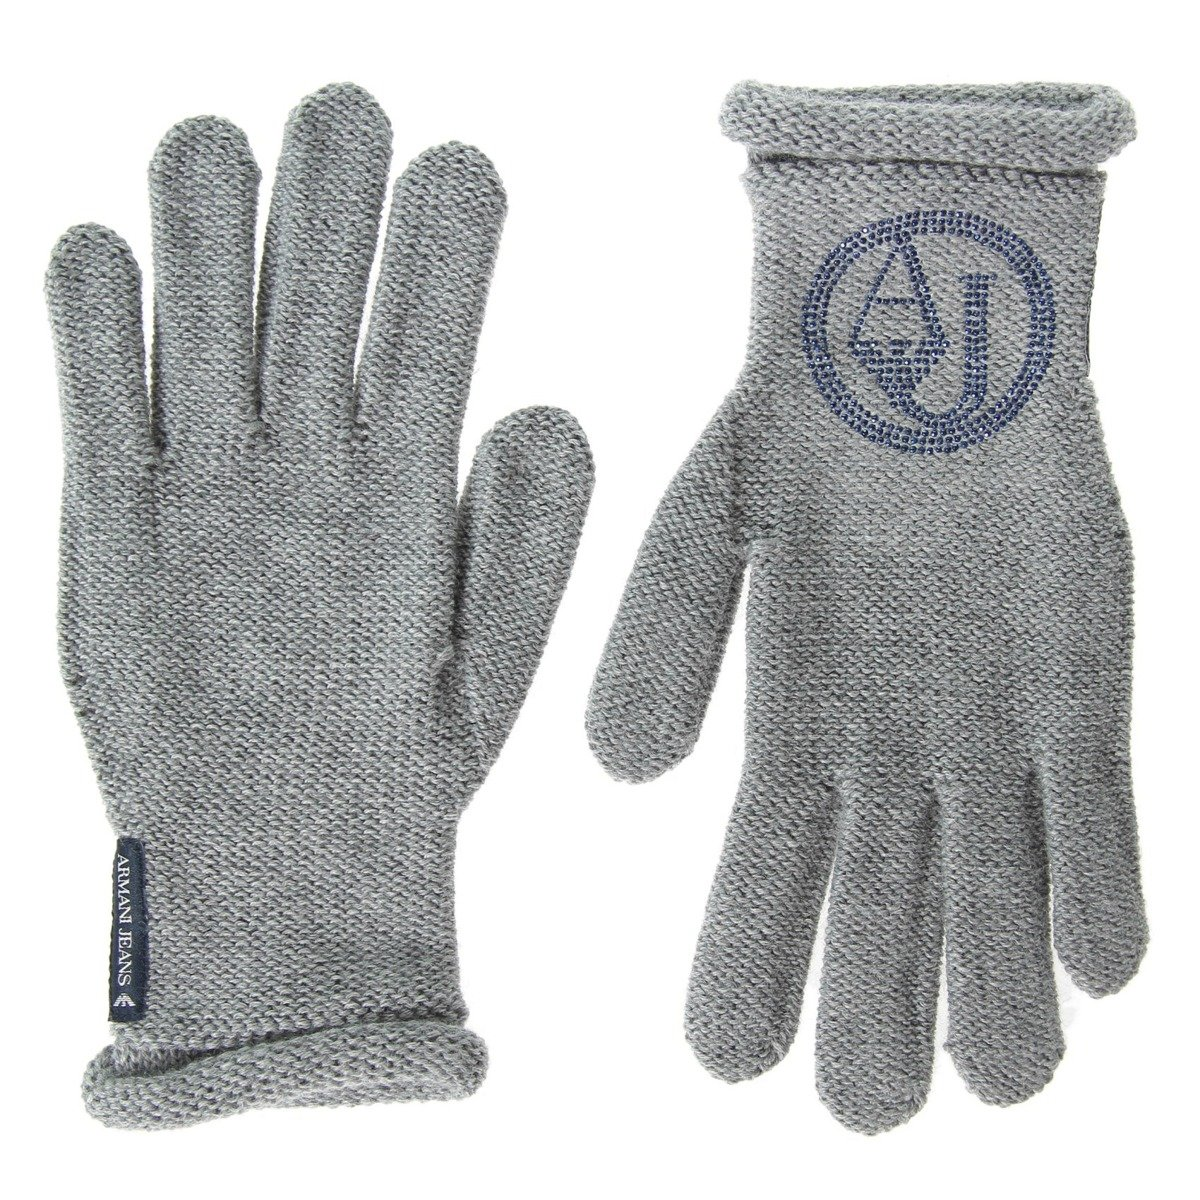 1b03b7003a4465 ARMANI JEANS Damen Women Handschuhe Gloves Grau Grey Made in Italy ...